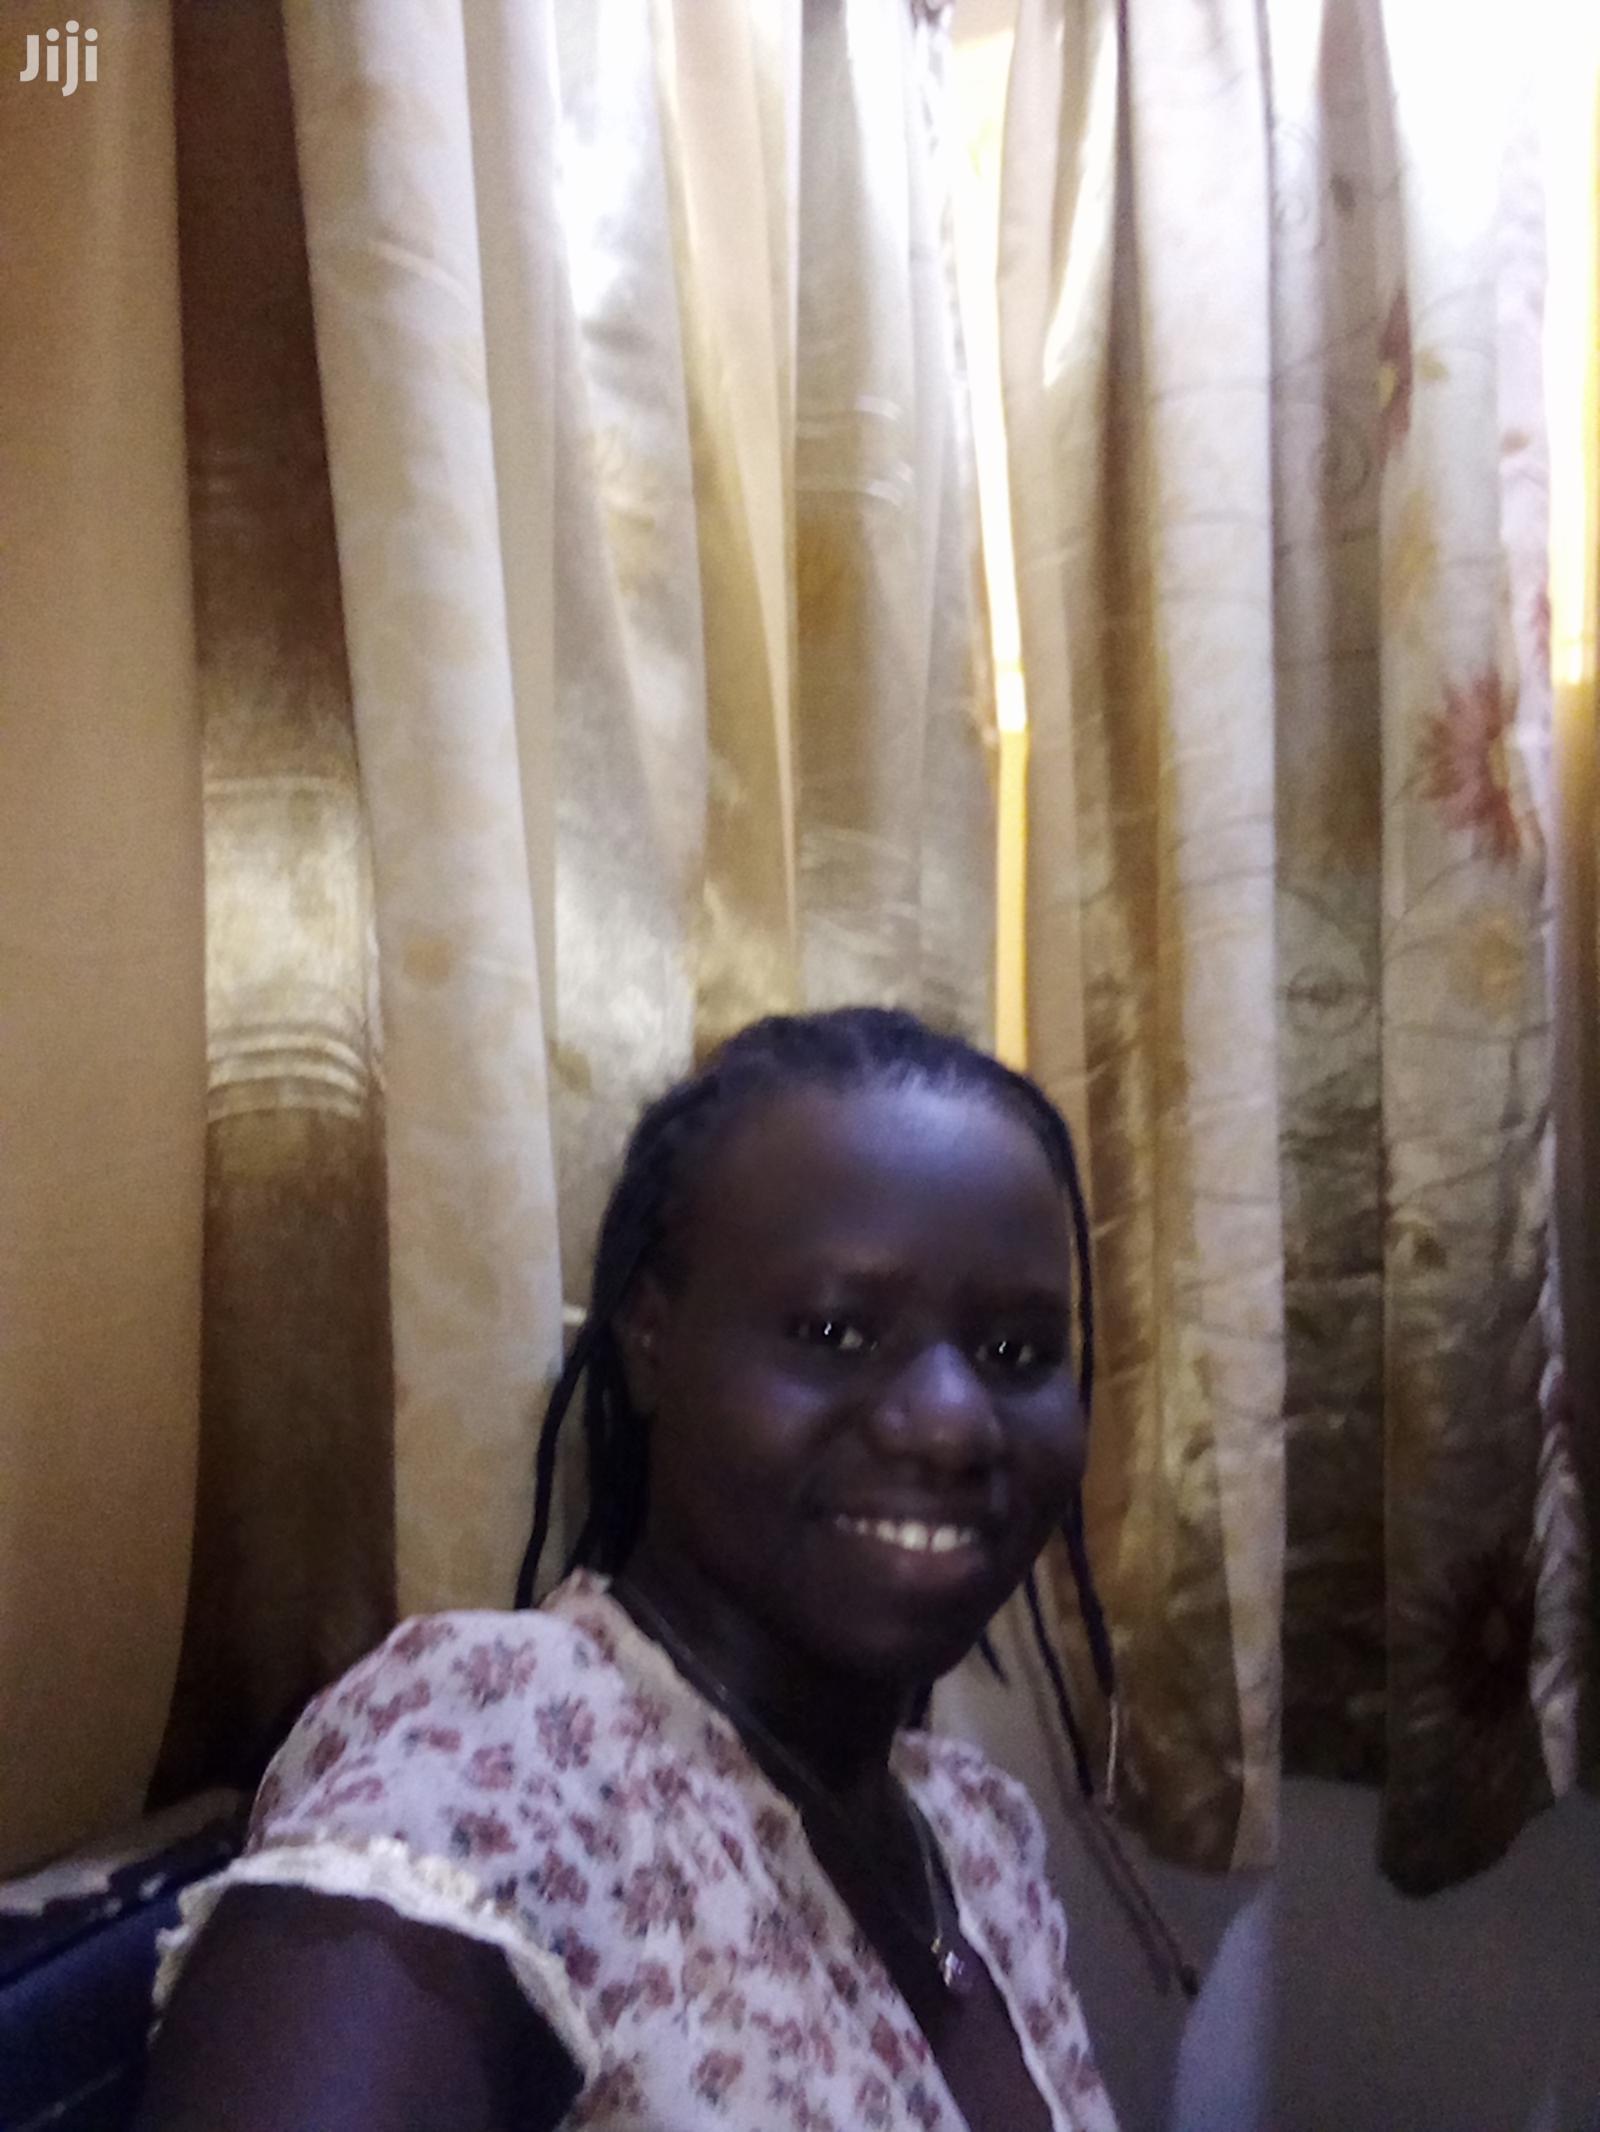 Latest Part Time Jobs In Nairobi CBD